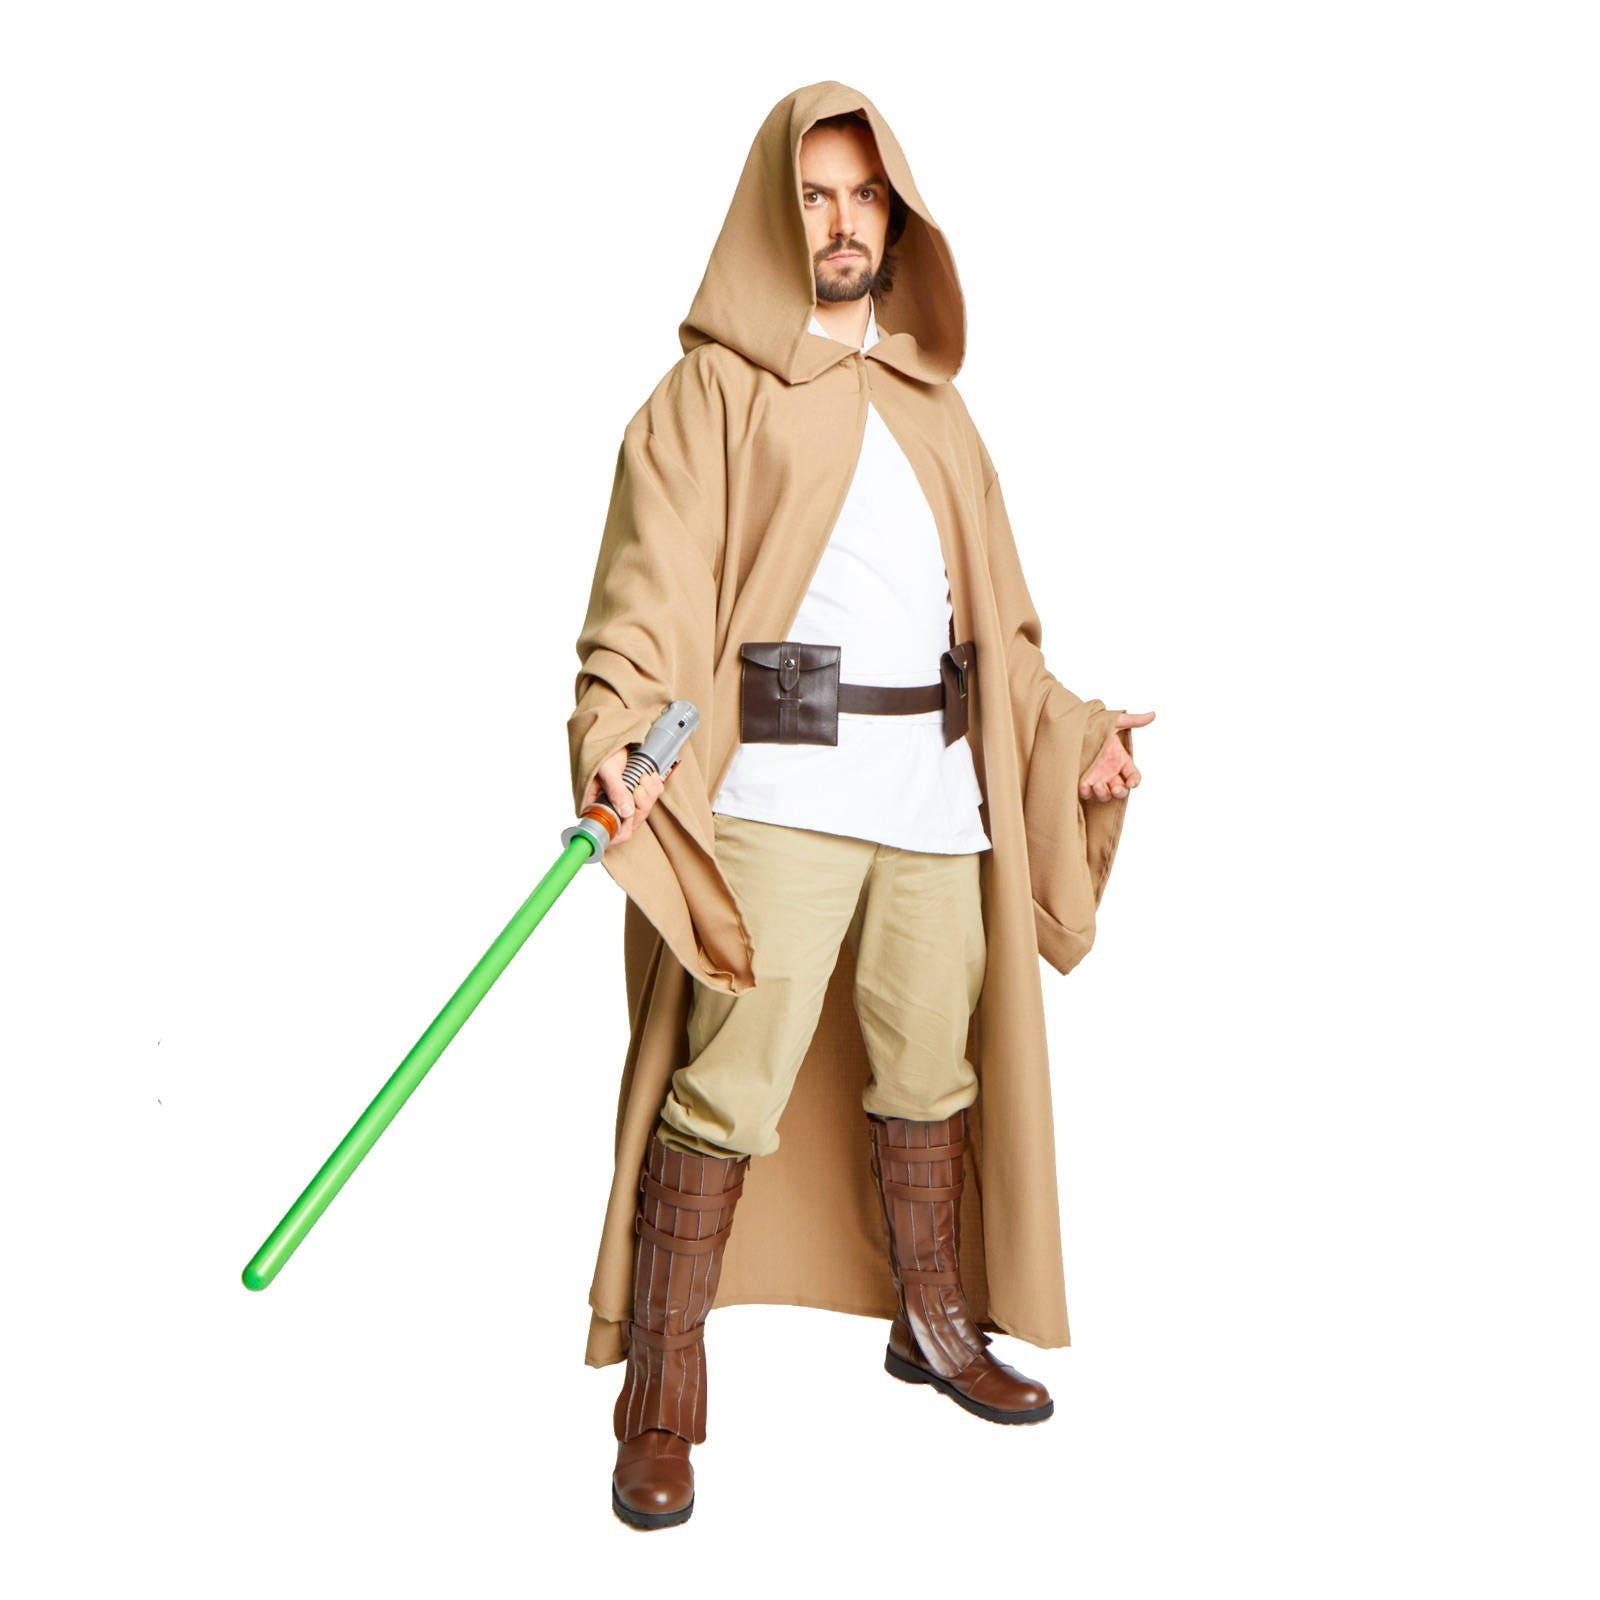 JEDI Obi Wan Wizard Costume CLOAK adult MONK Robe Brown Small Medium Large WU9ZywOp